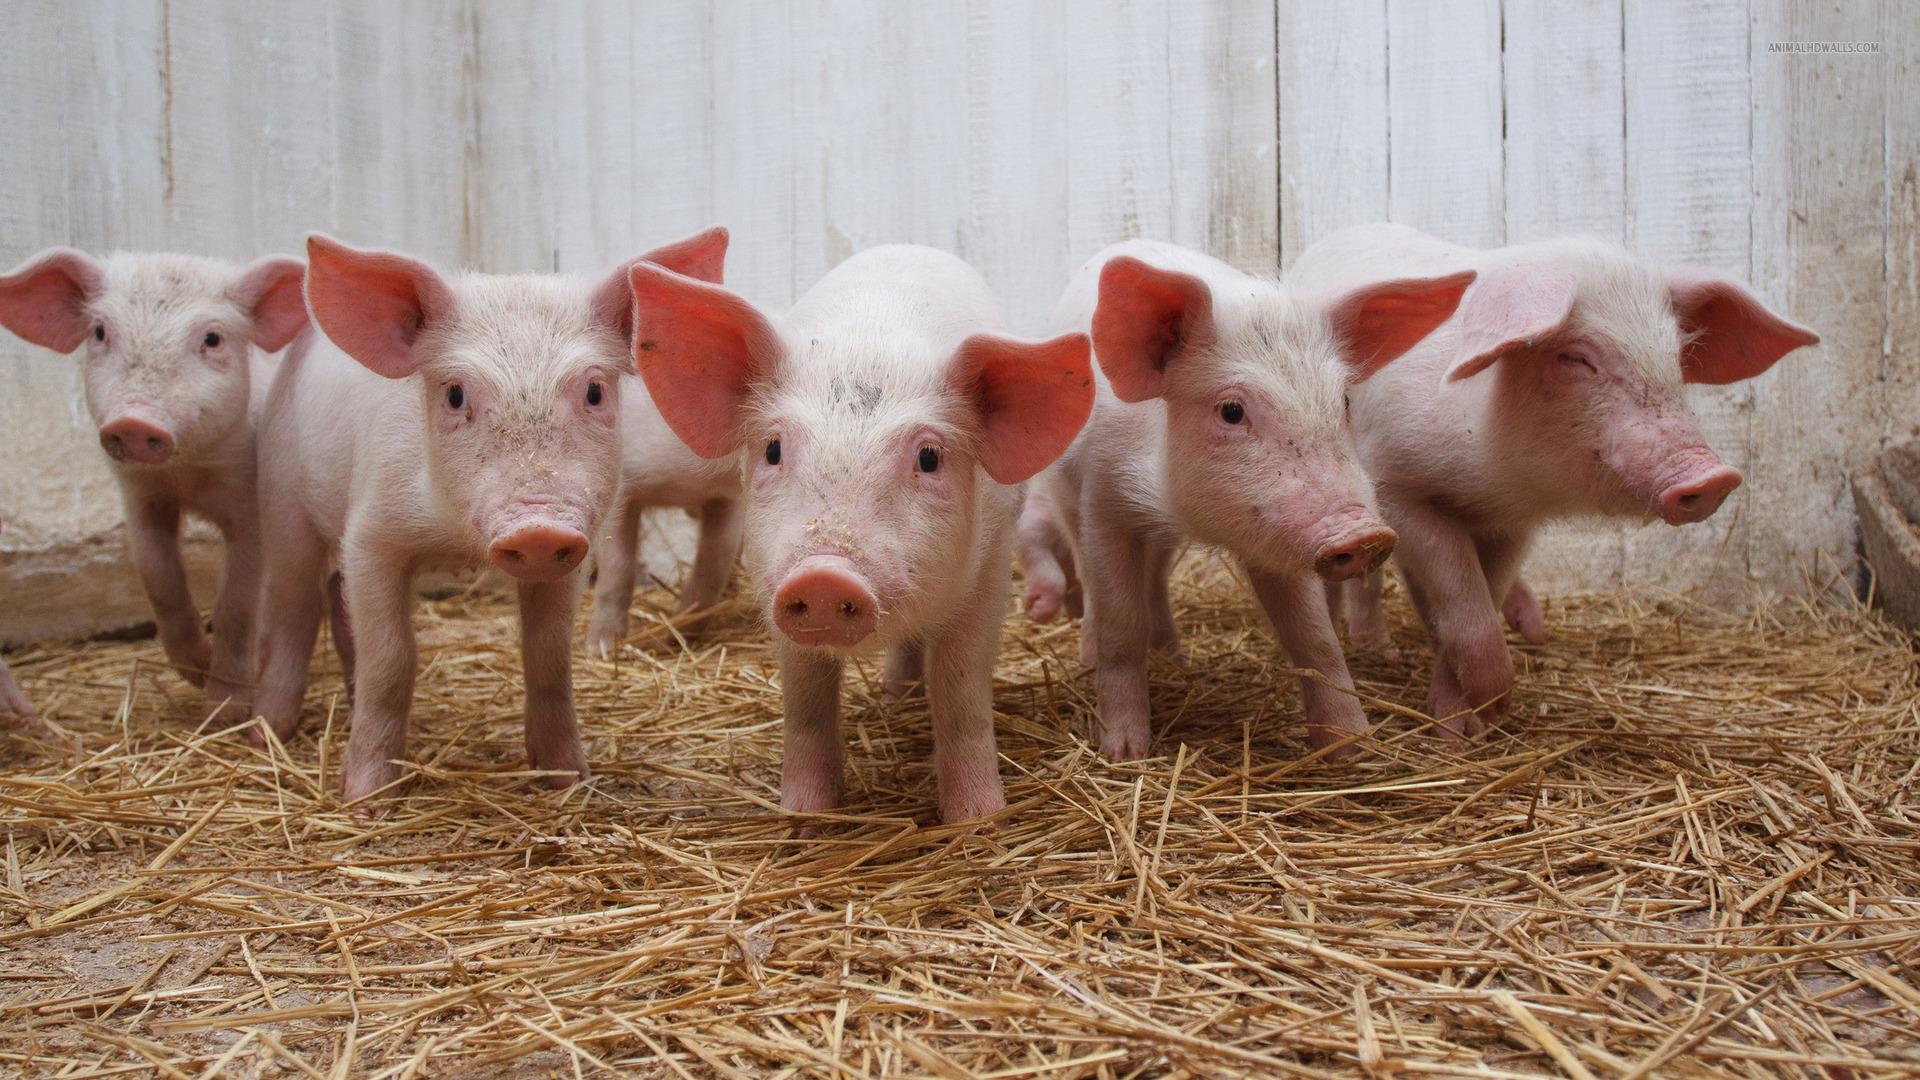 piglets-hd-photos-7